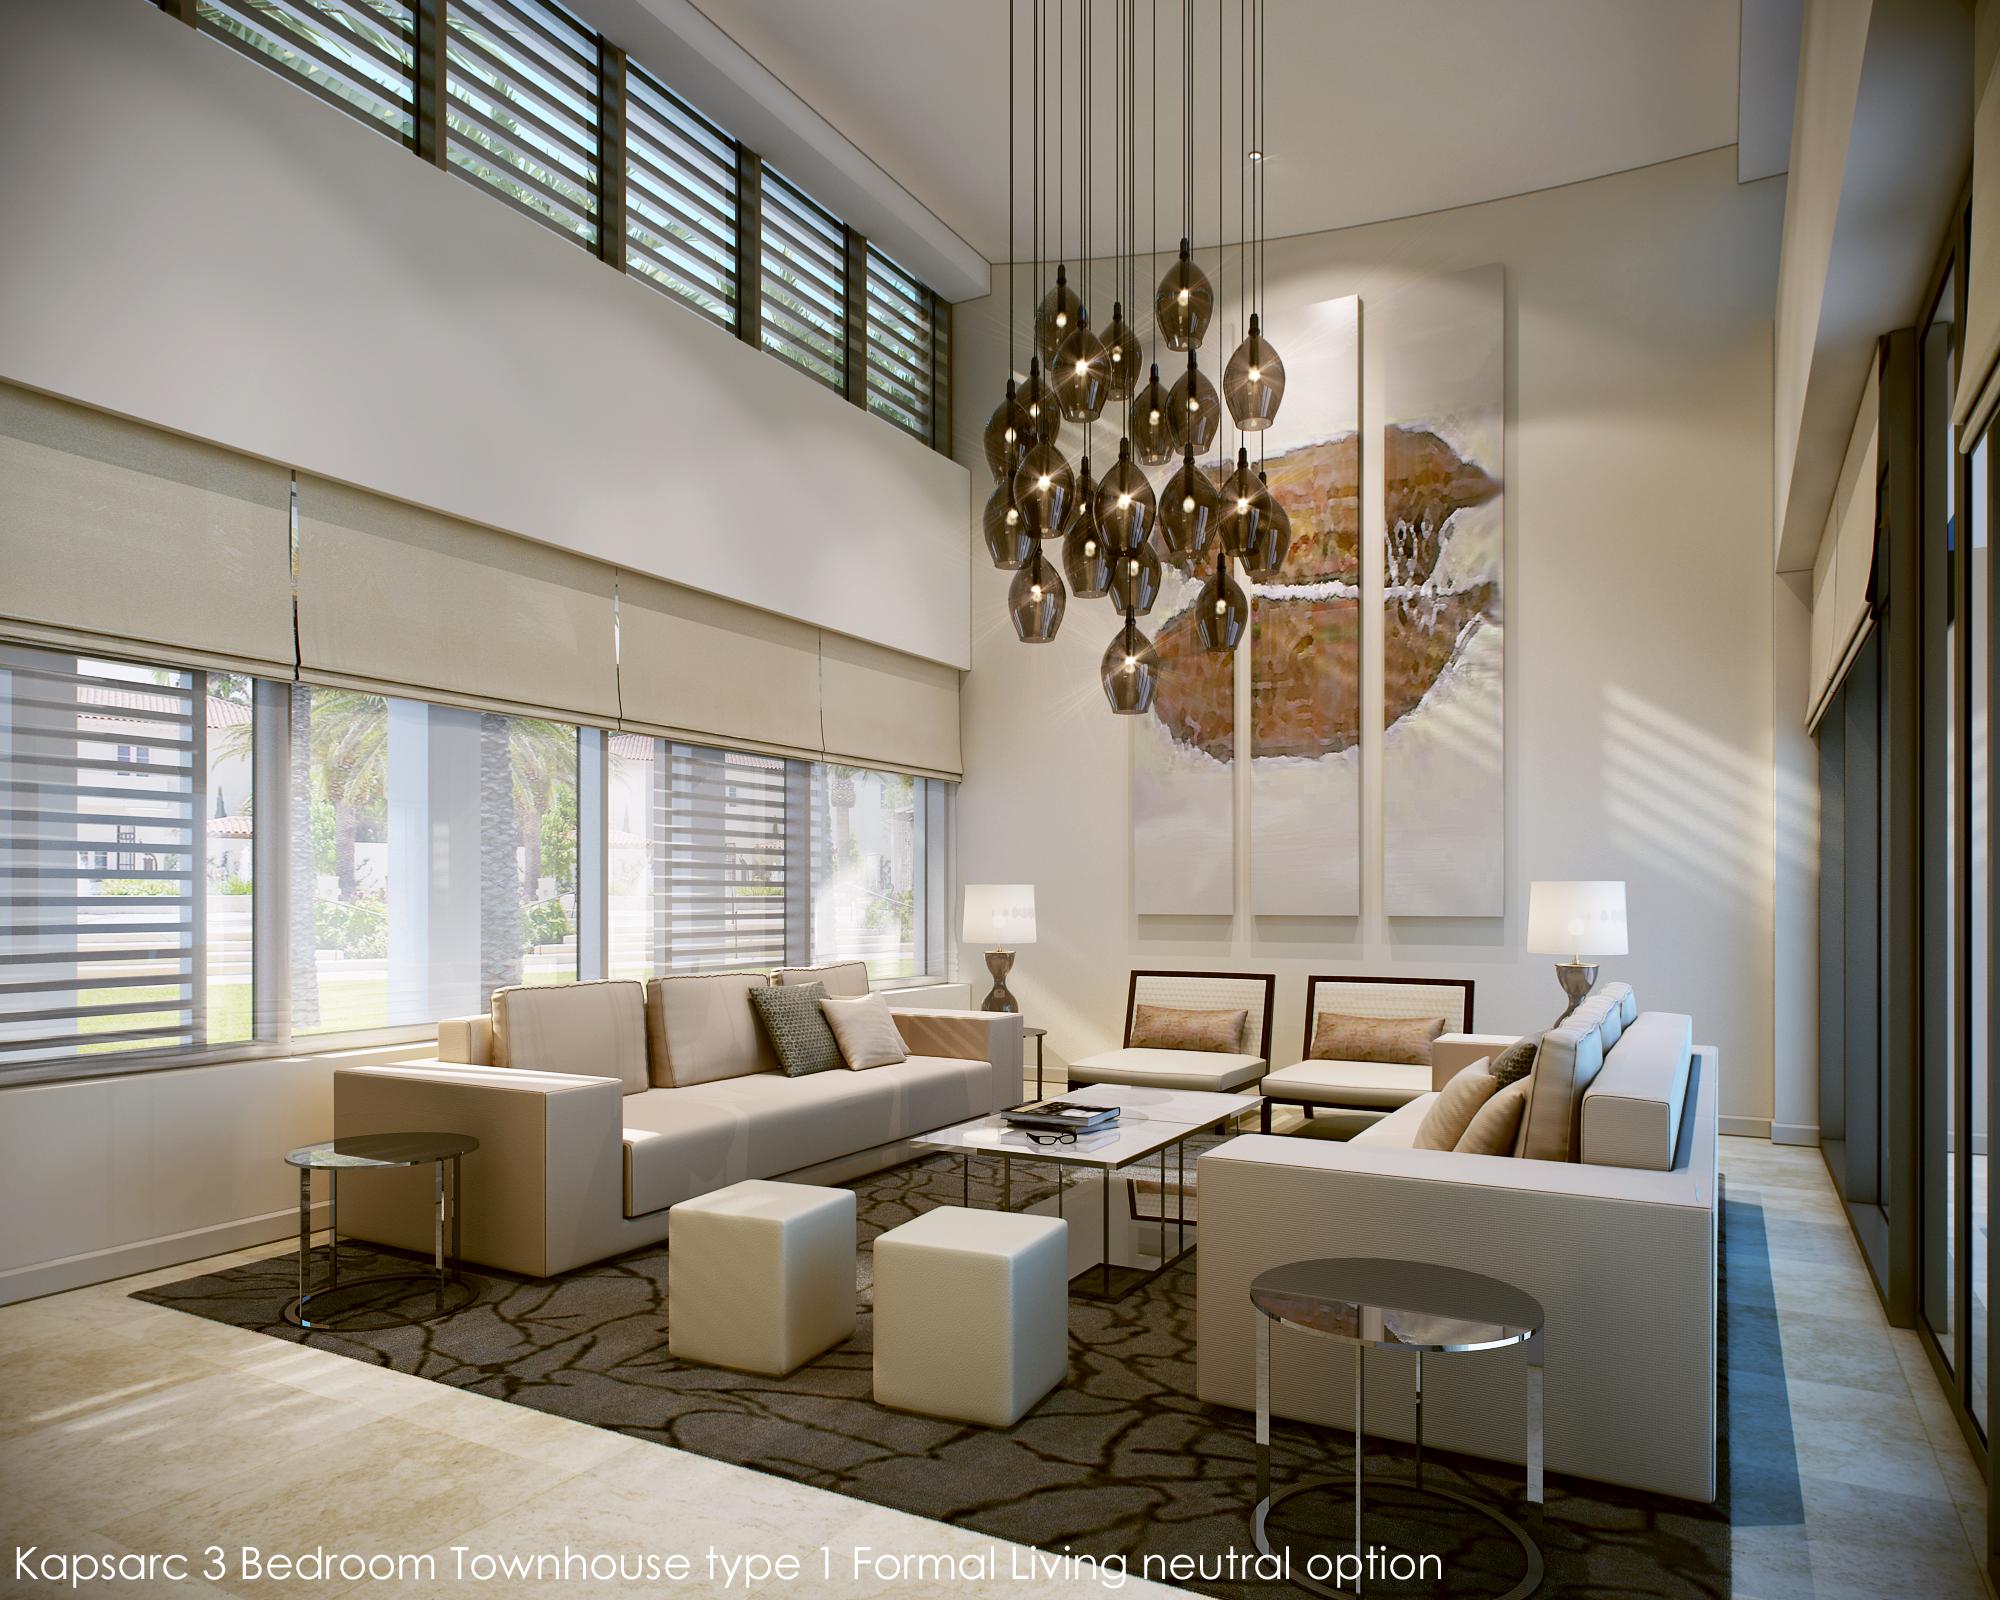 Kapsarc 3 Bedroom Townhouse type 1 Formal Living neutral opt.jpg